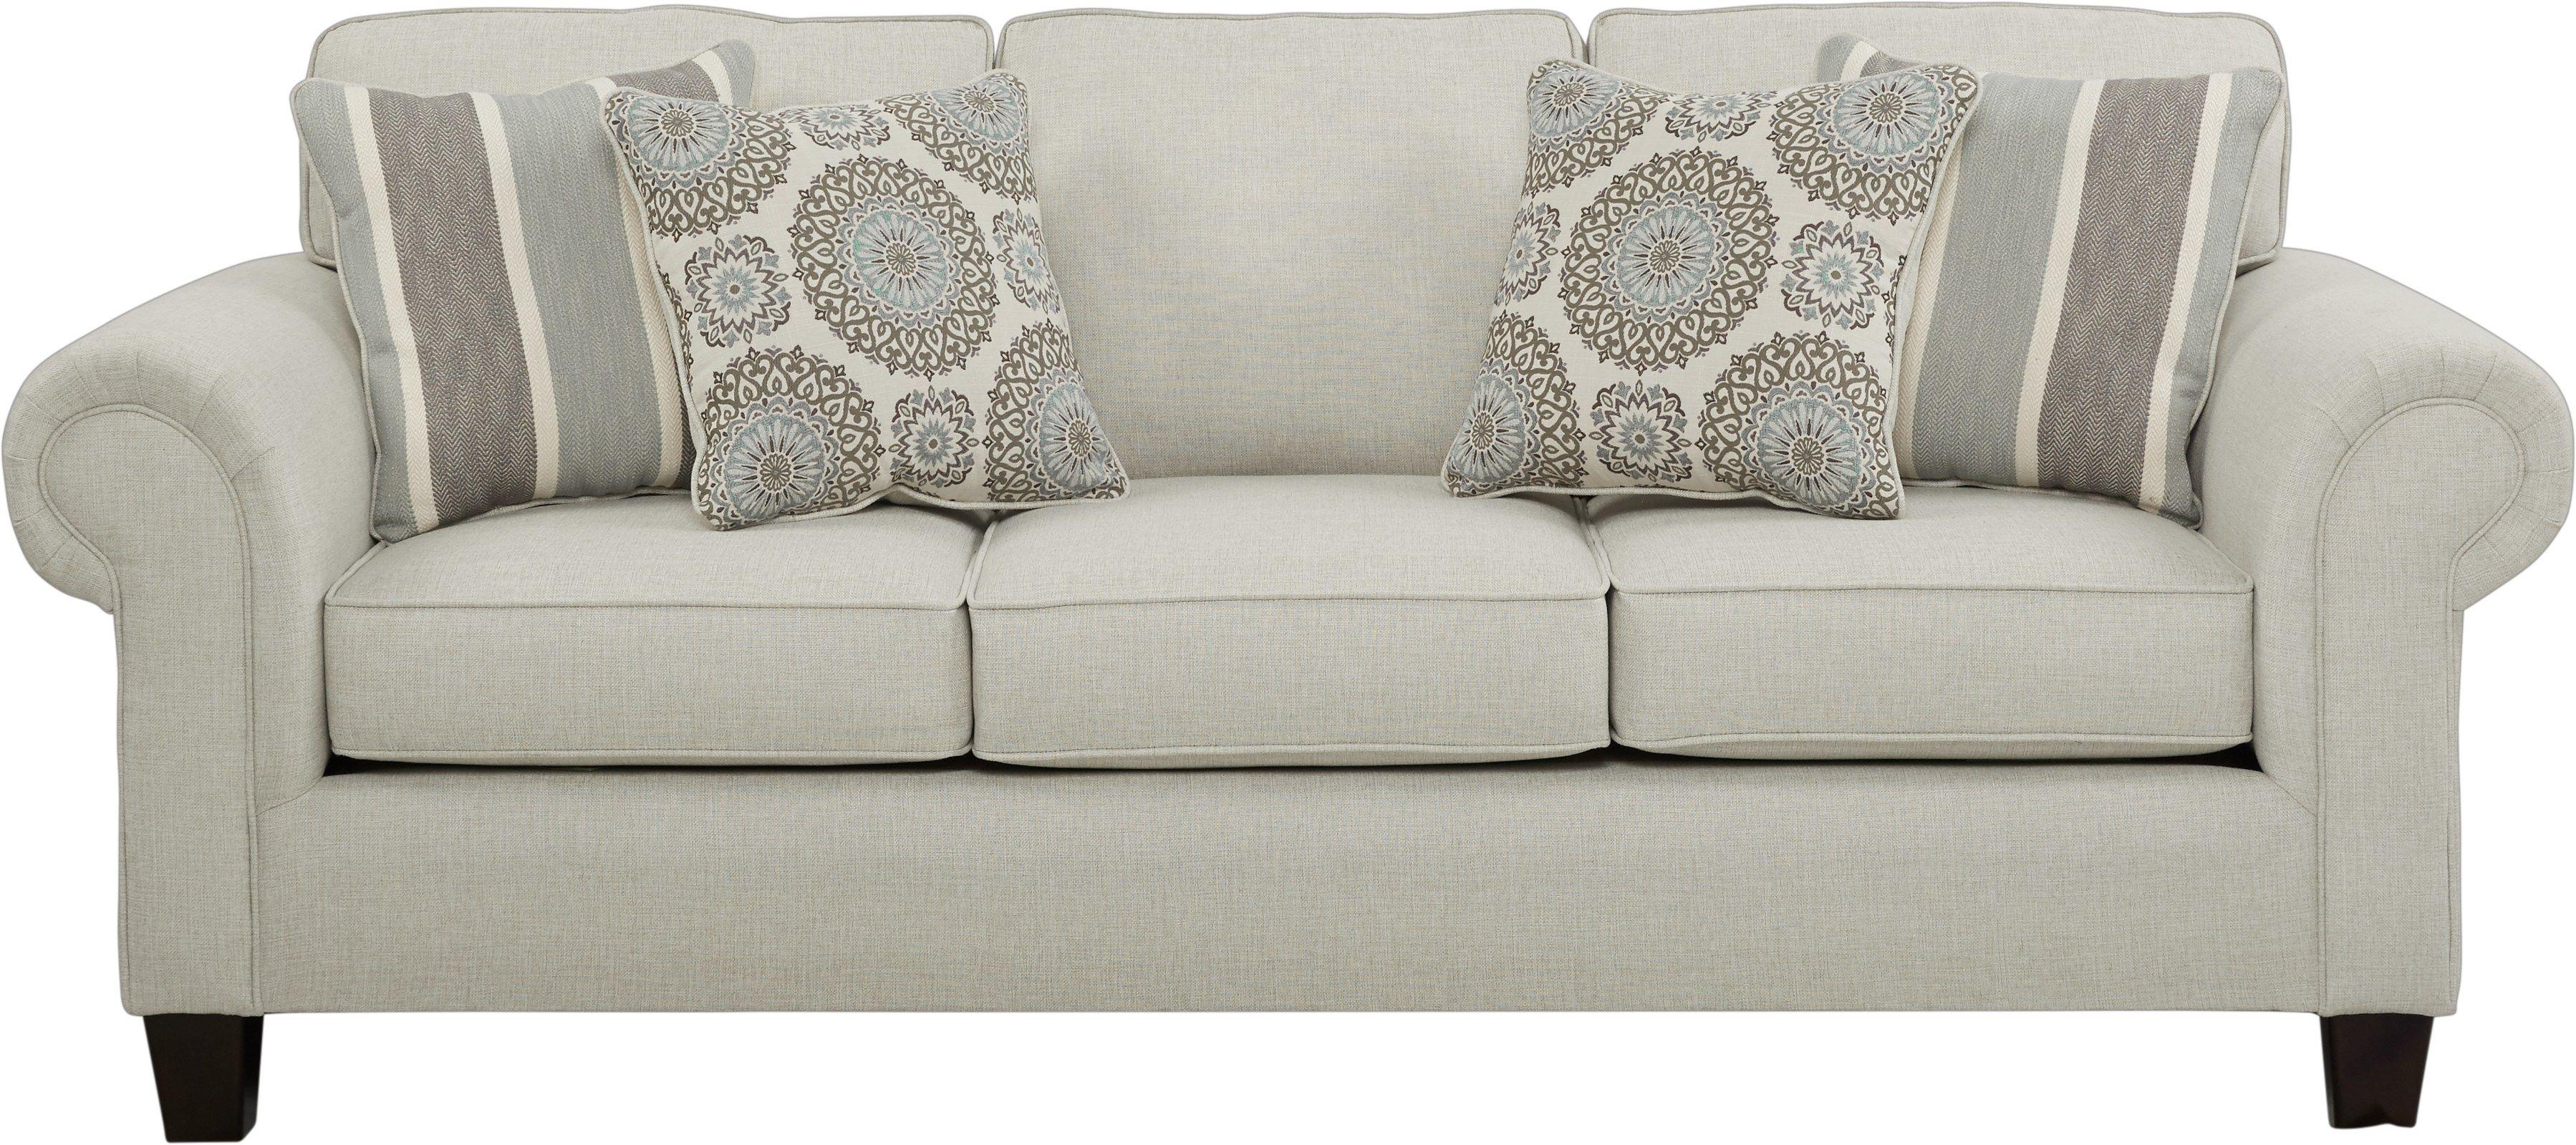 Pennington Sand Sofa Affordable Sofa Living Room Sofa